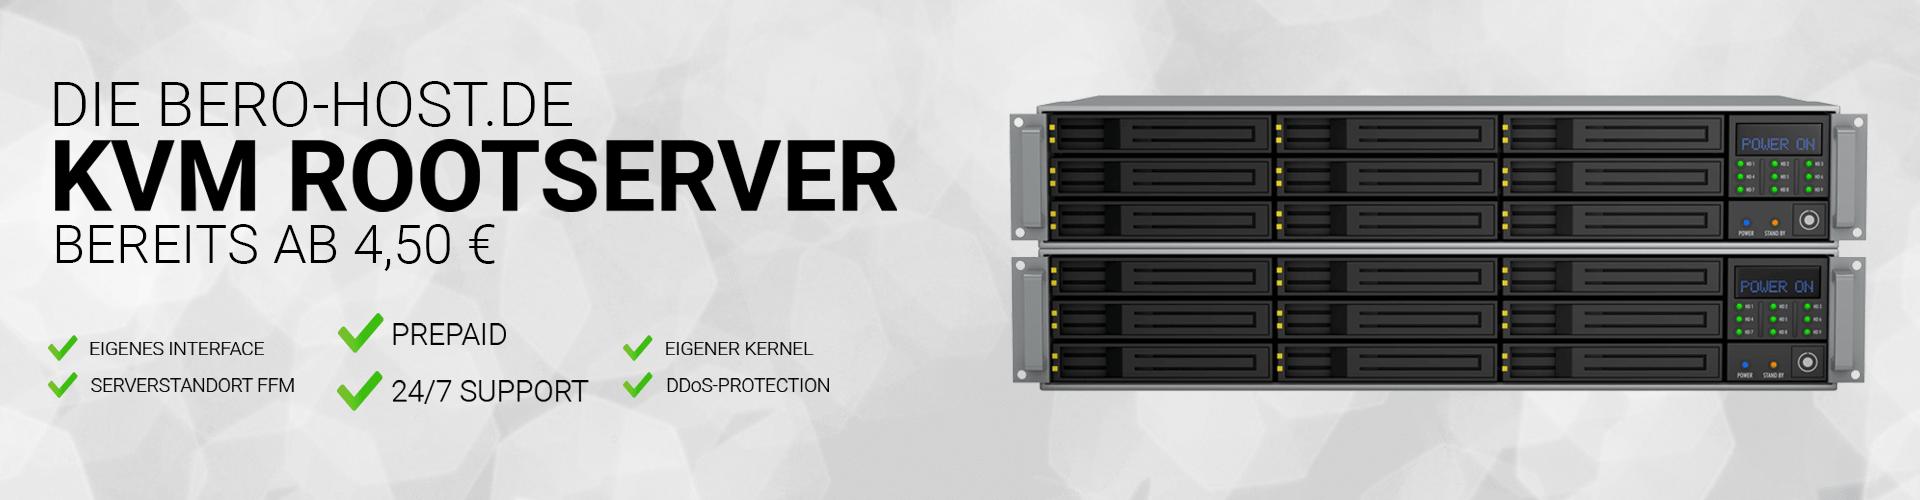 Günstige Prepaid SSD KVM Rootserver Server ab 4,50€ pro Monat